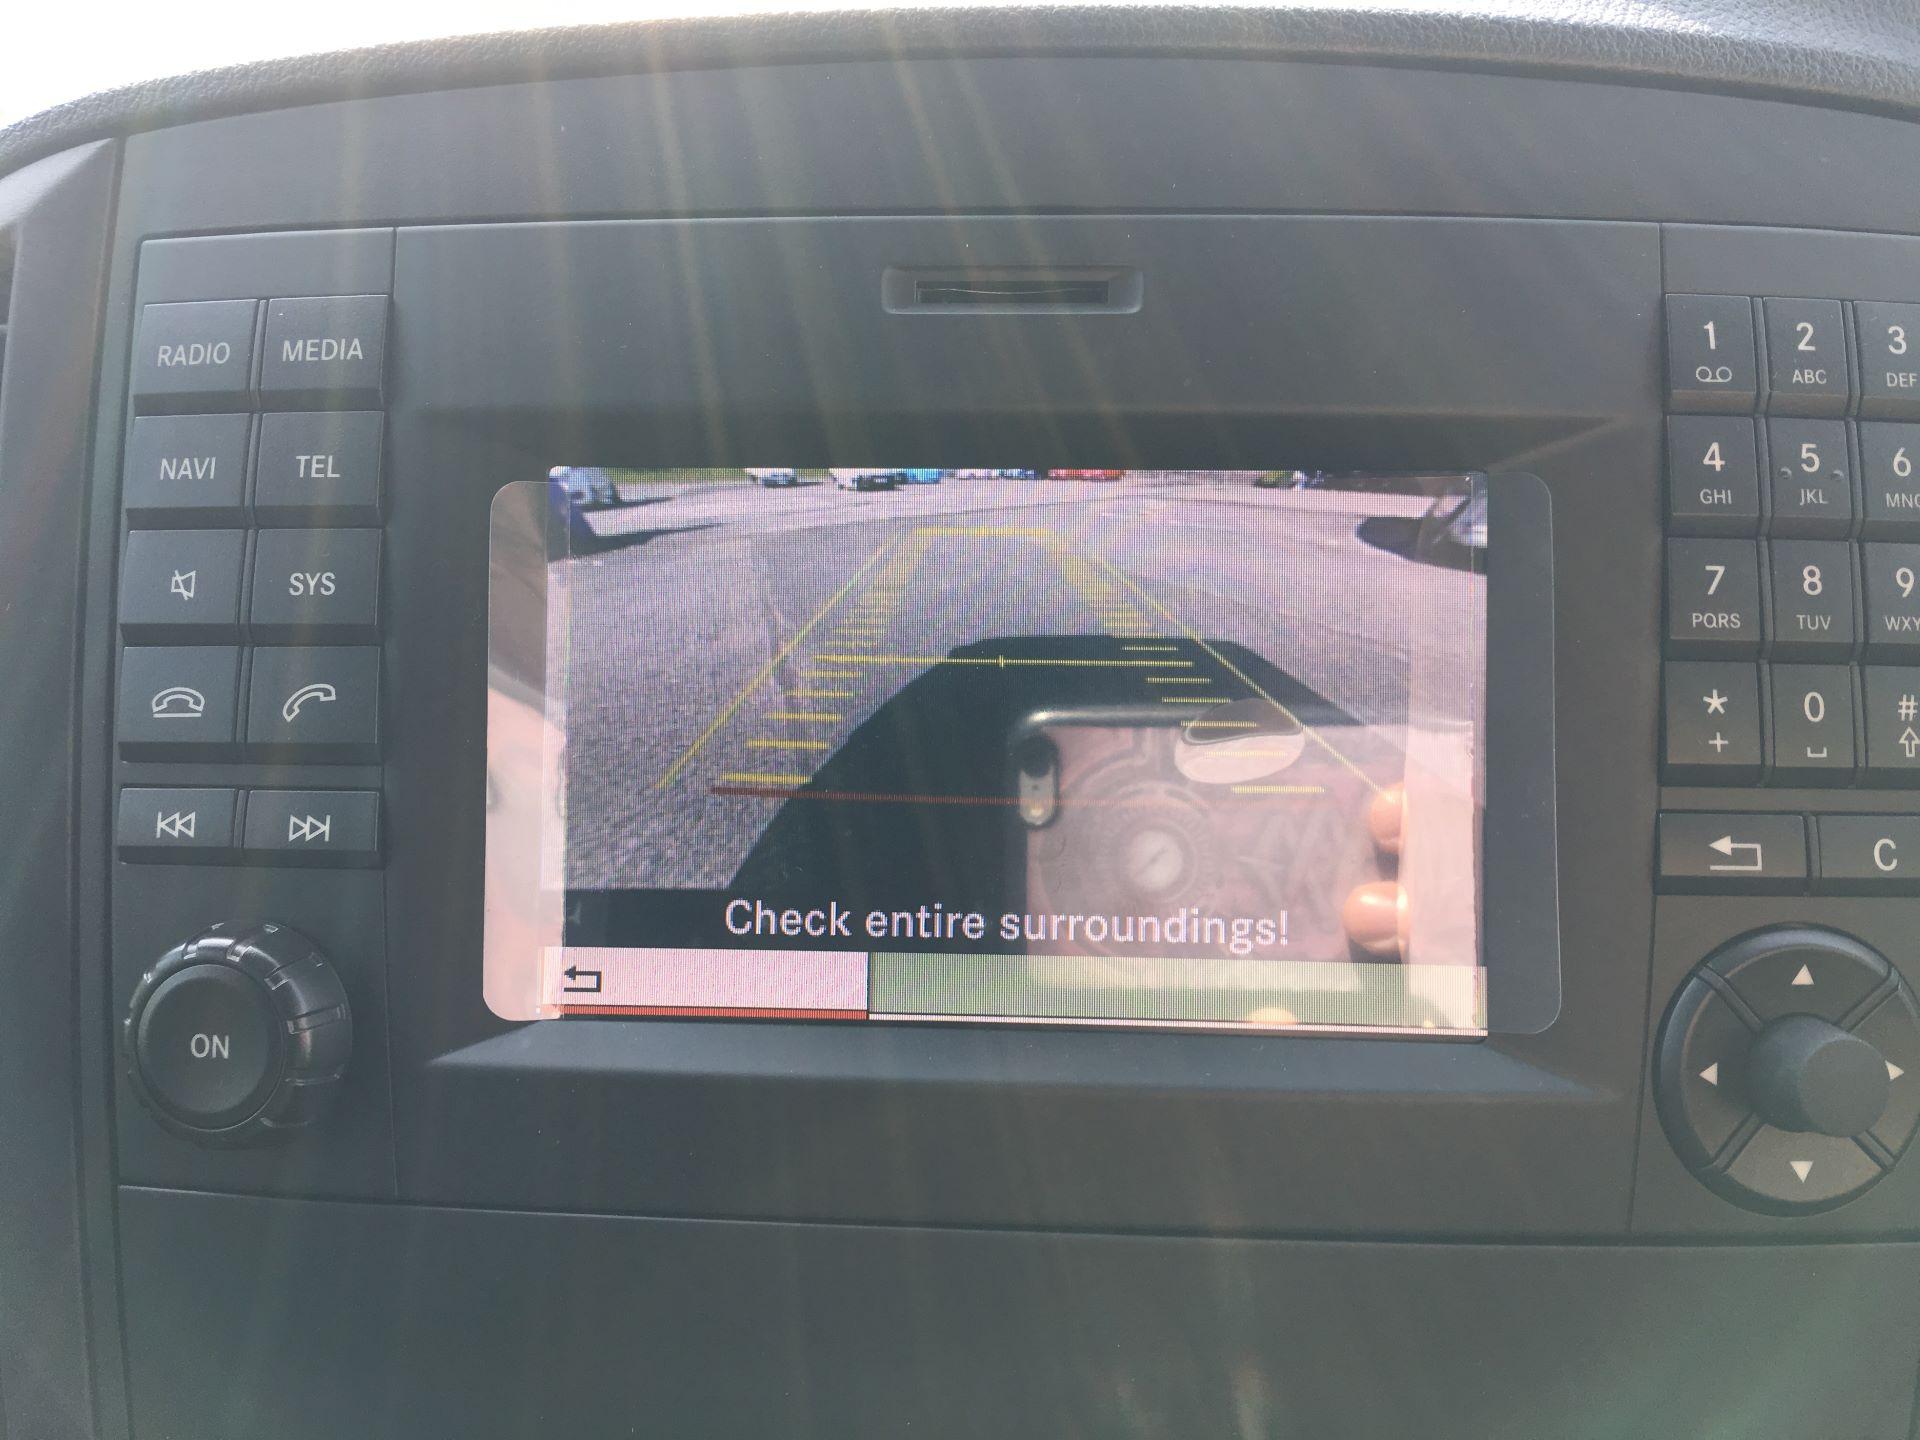 2019 Mercedes-Benz Vito LONG 111 CDI VAN EURO 5/6 (YM19HFZ) Image 10